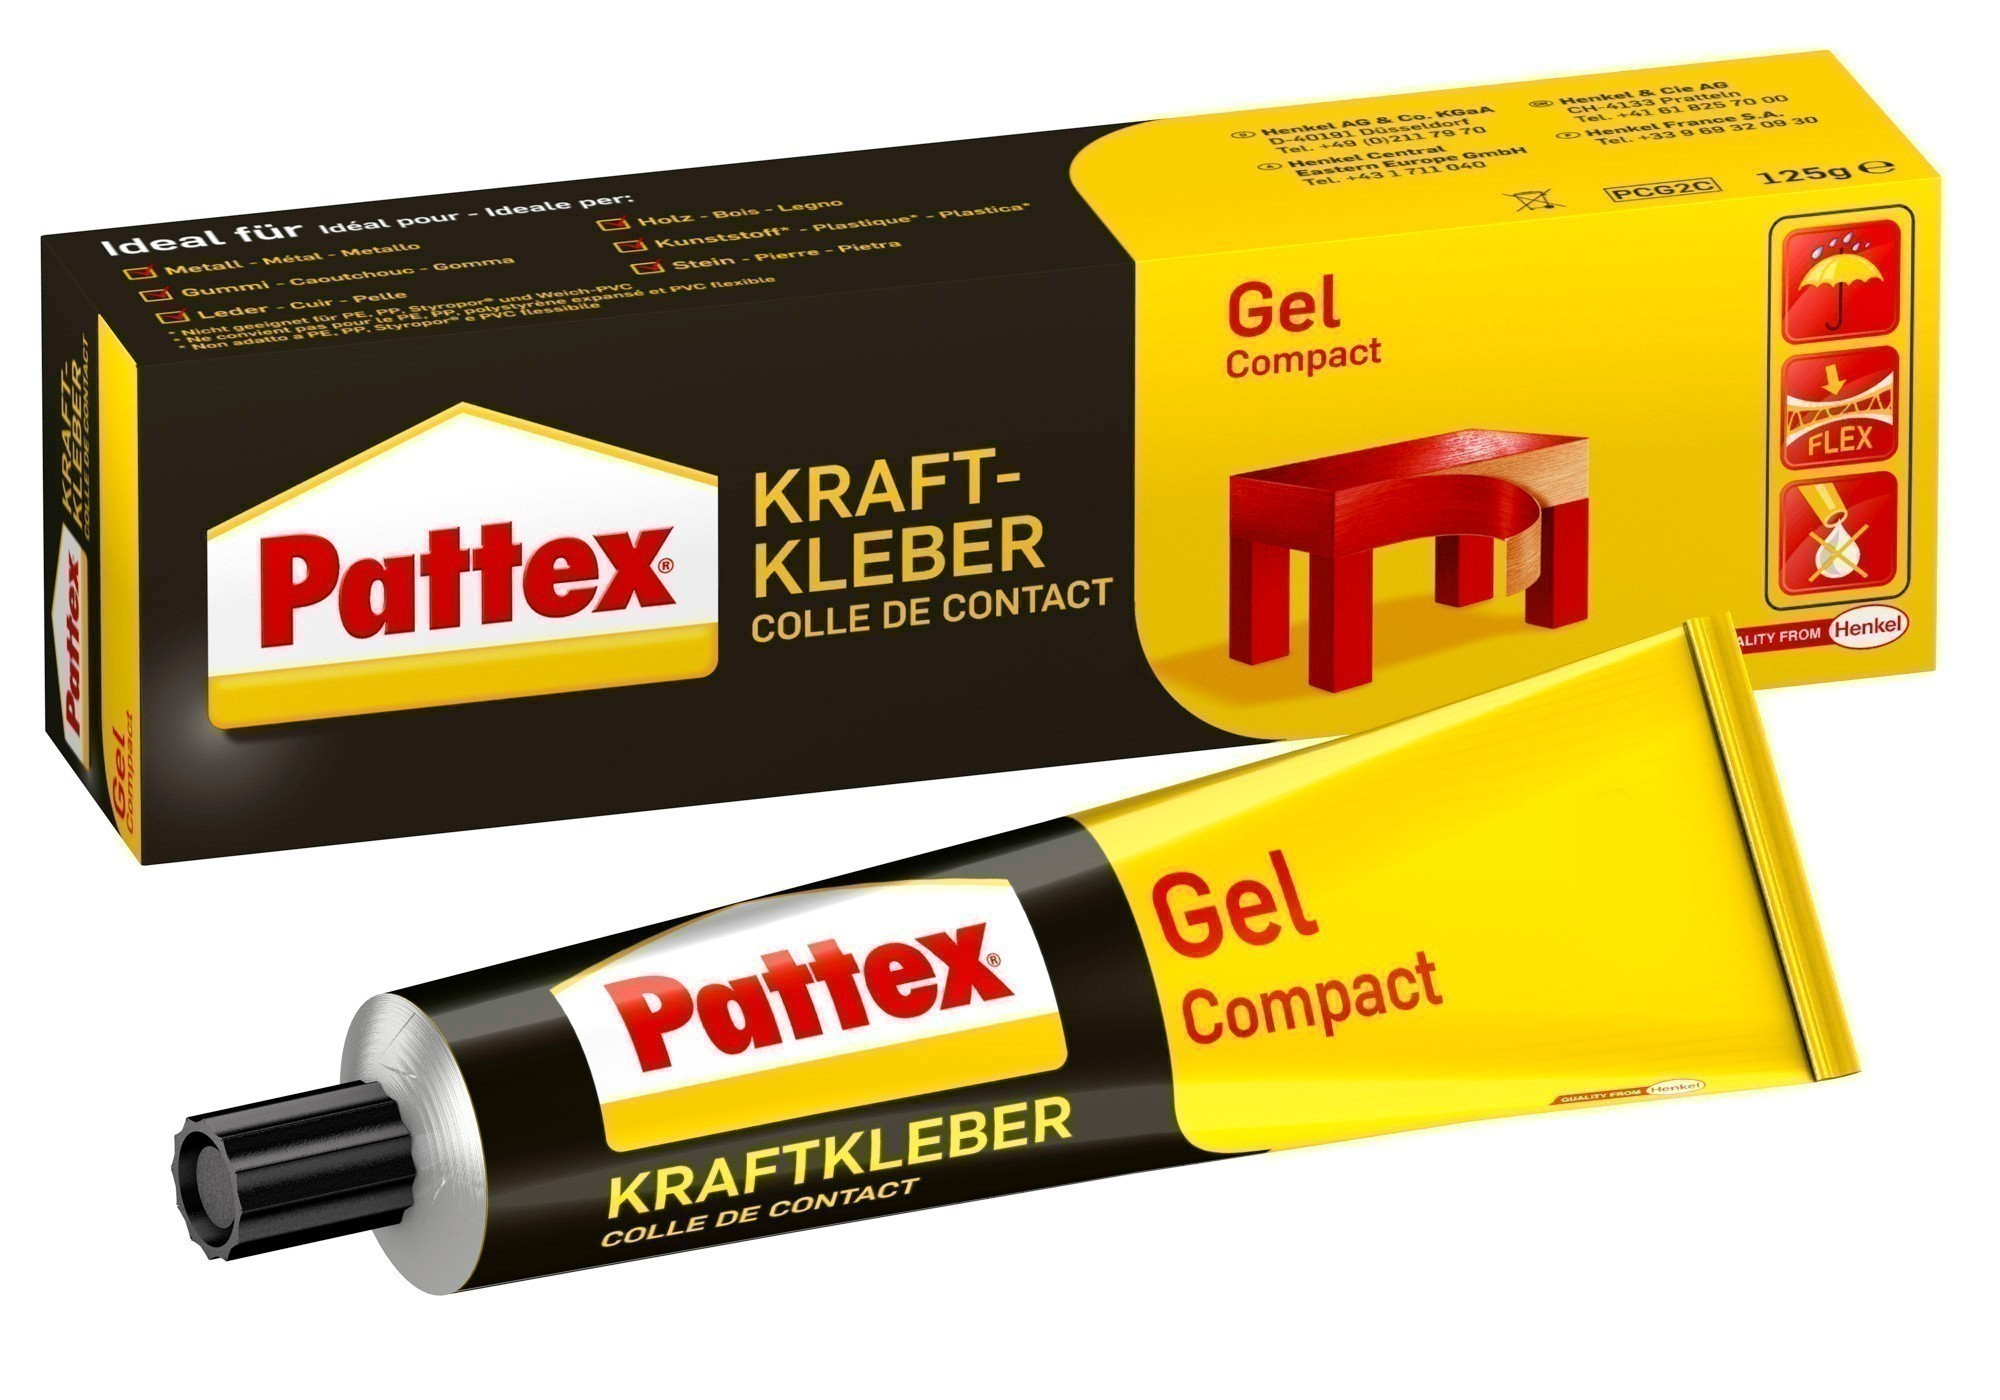 Pattex Kraftkleber Gel / Compact 50g Bild 1